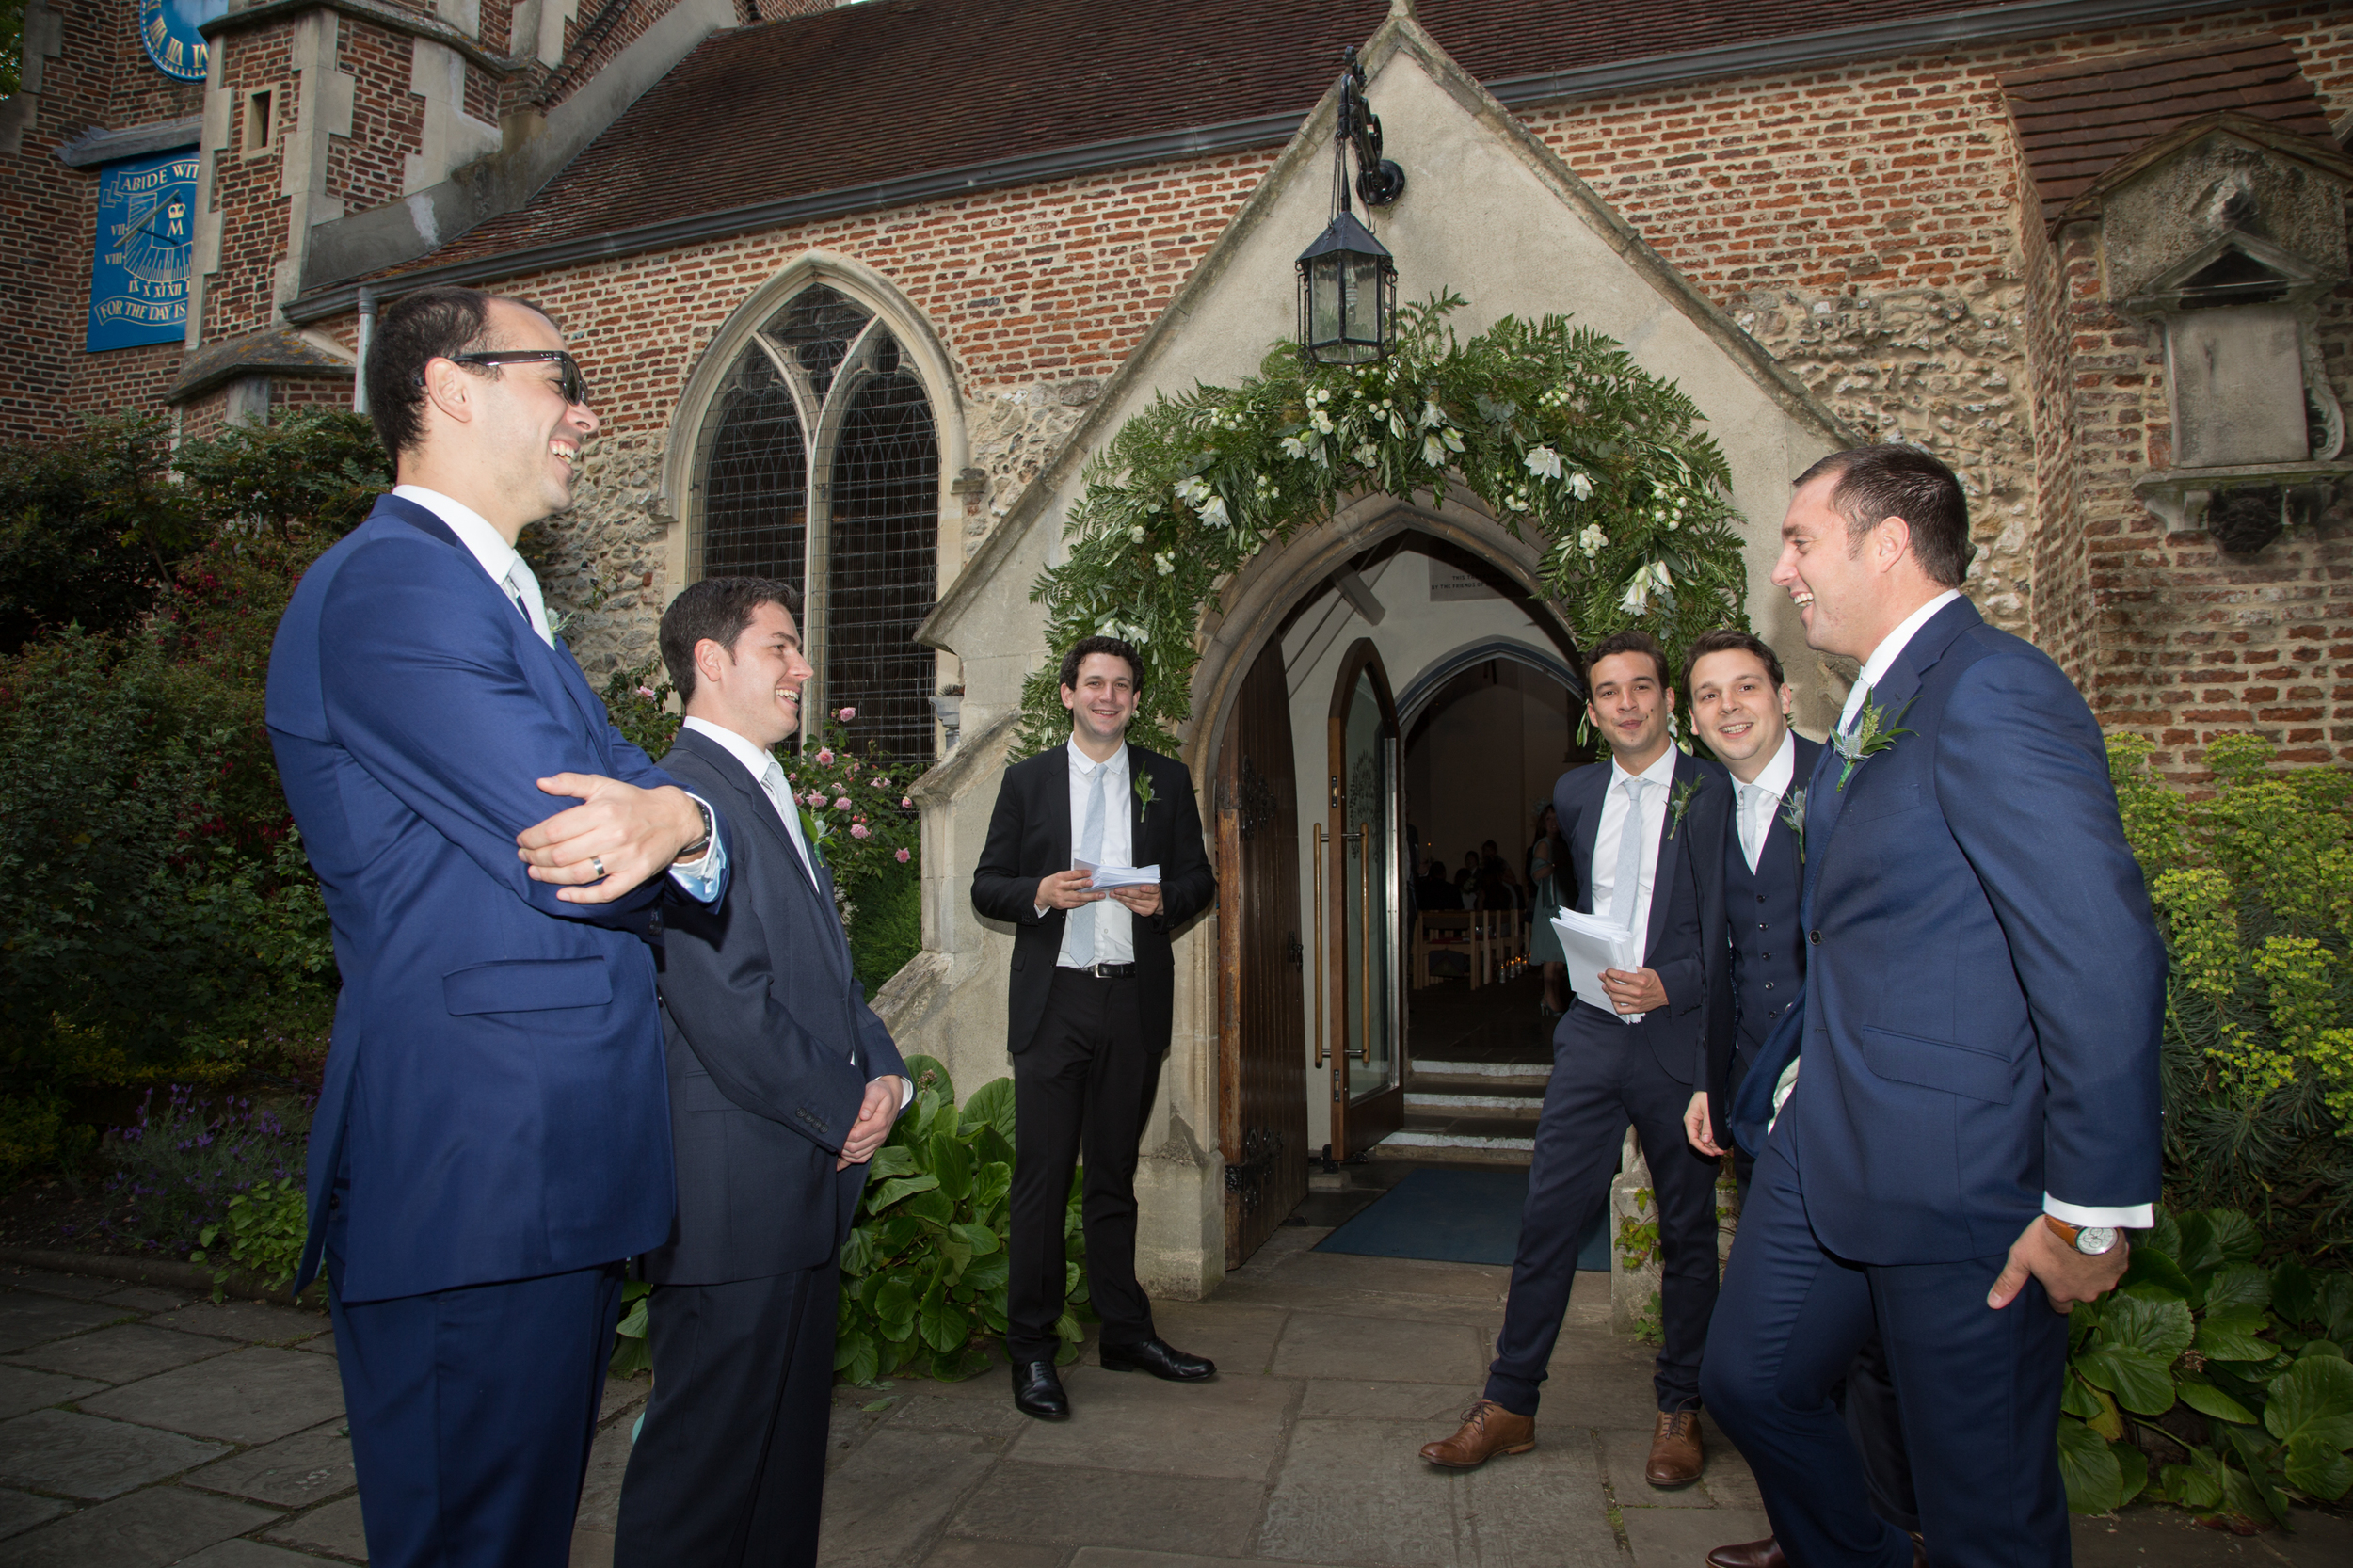 groomsmen-st-mary's-church-barnes-london-uk-destination-wedding-photography-Adam-Rowley